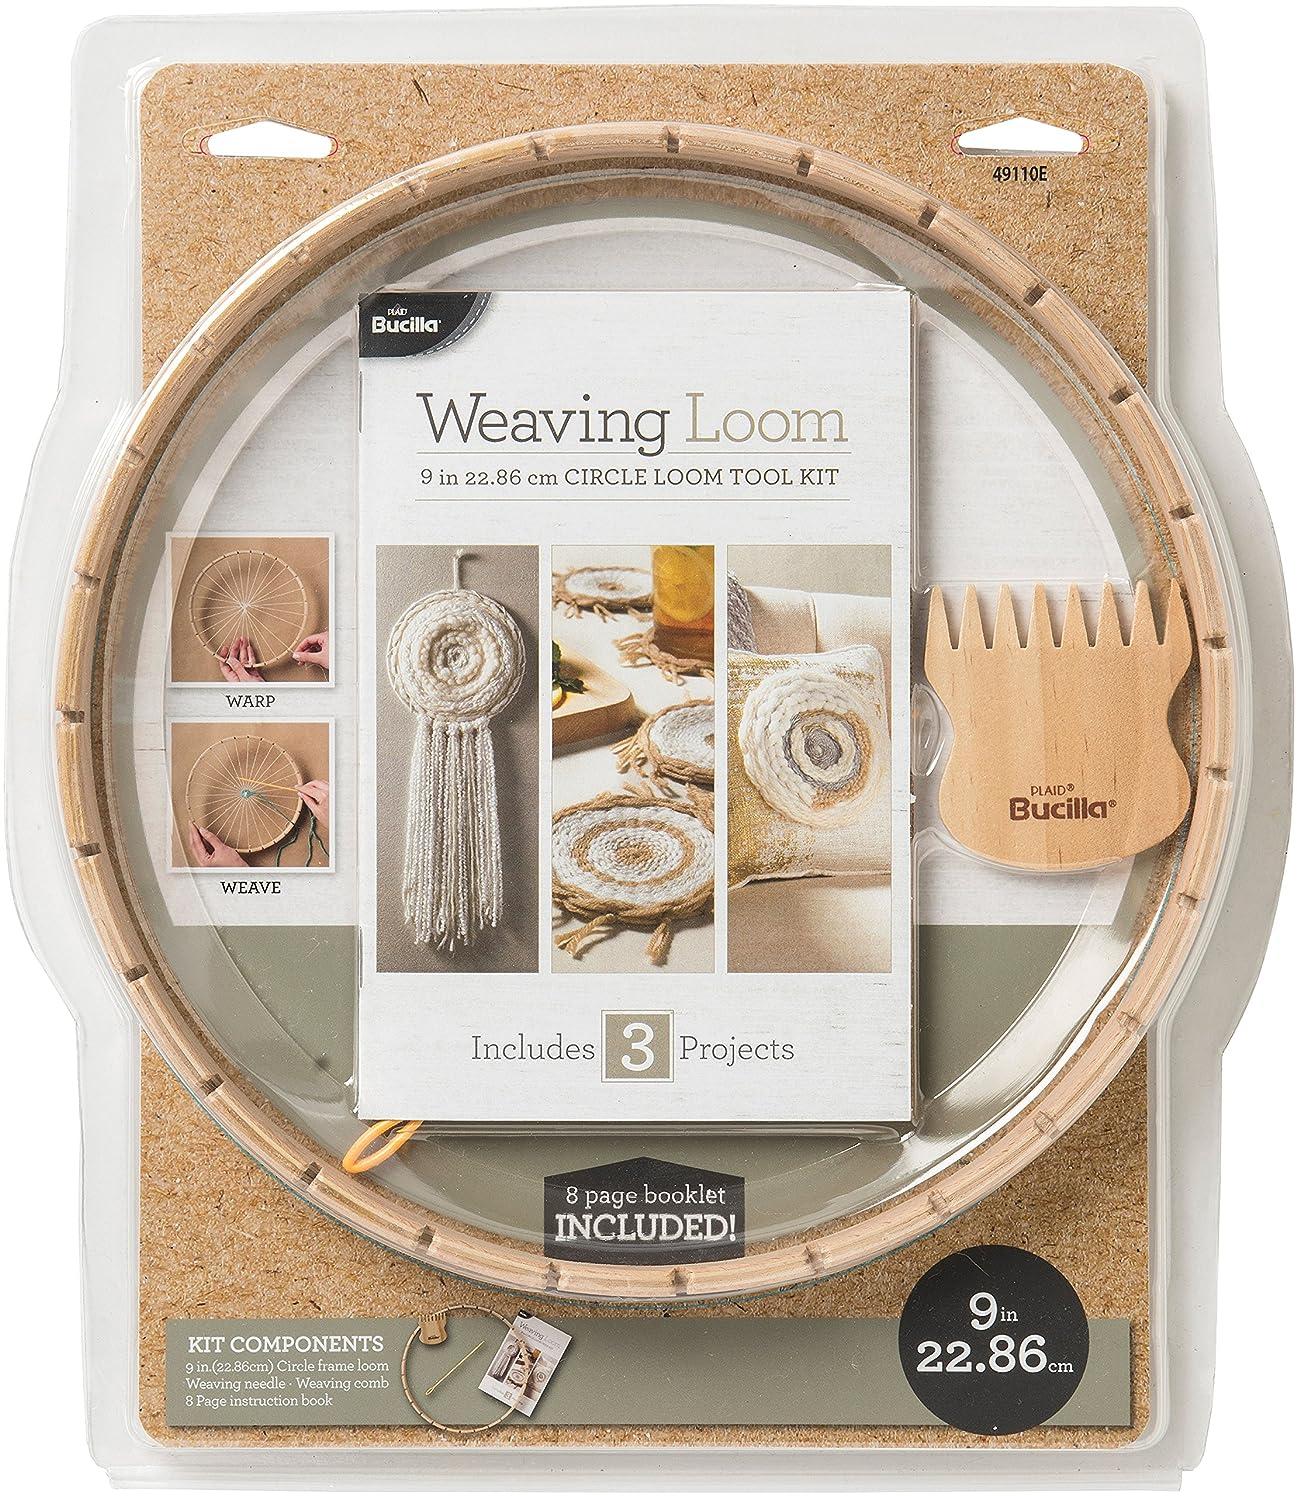 Bucilla 49110 Weaving Loom Kit, 9 in, Circle Loom Tool Kit